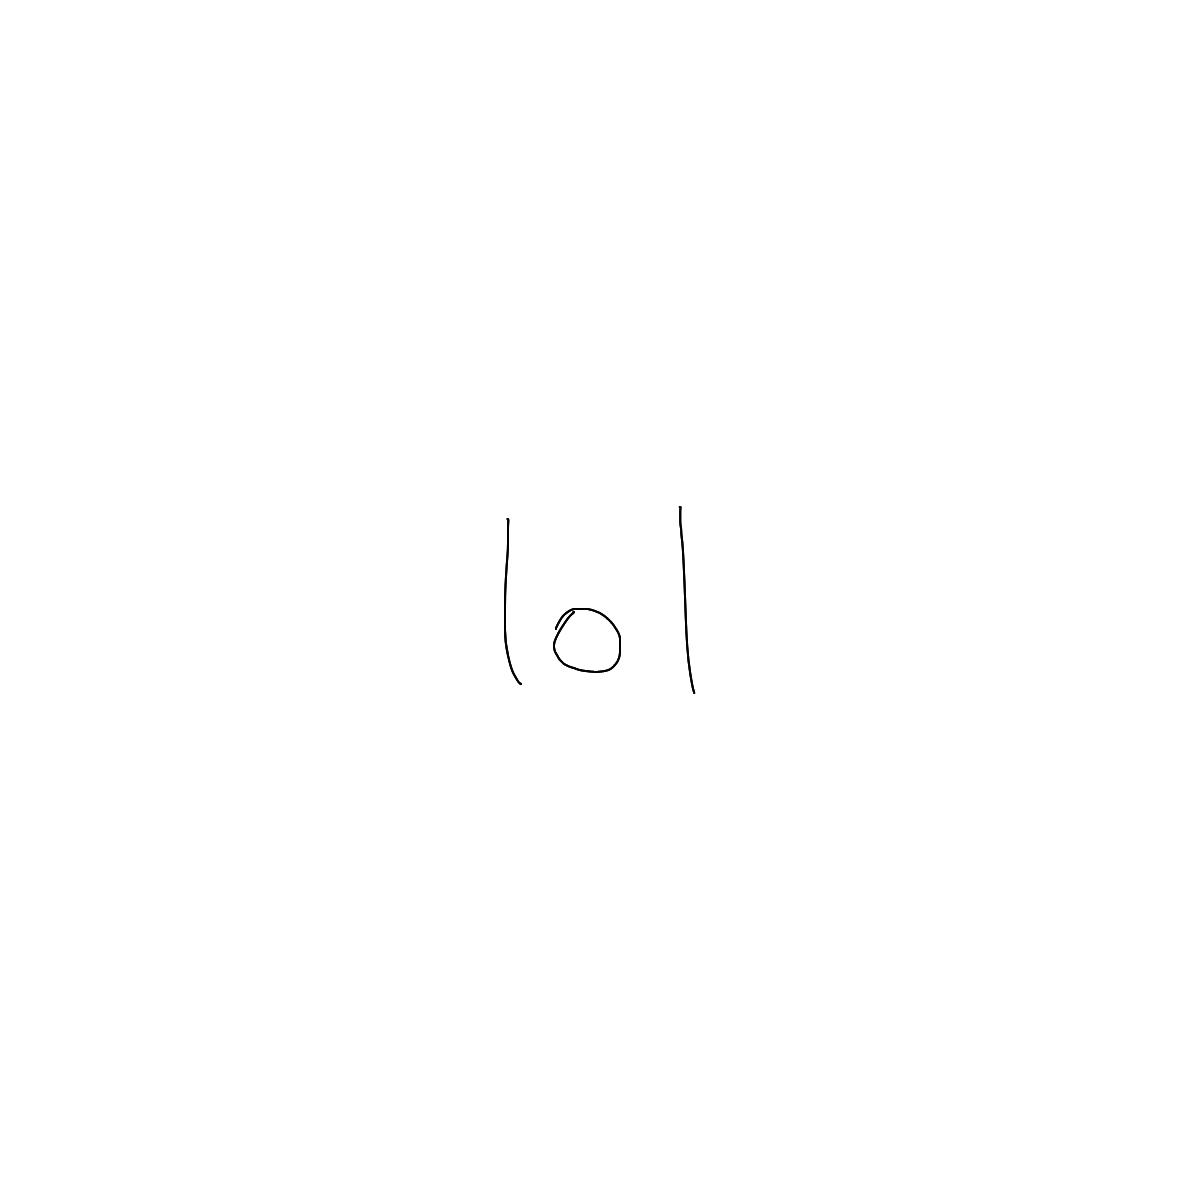 BAAAM drawing#23876 lat:38.0376358032226560lng: -84.5979232788086000